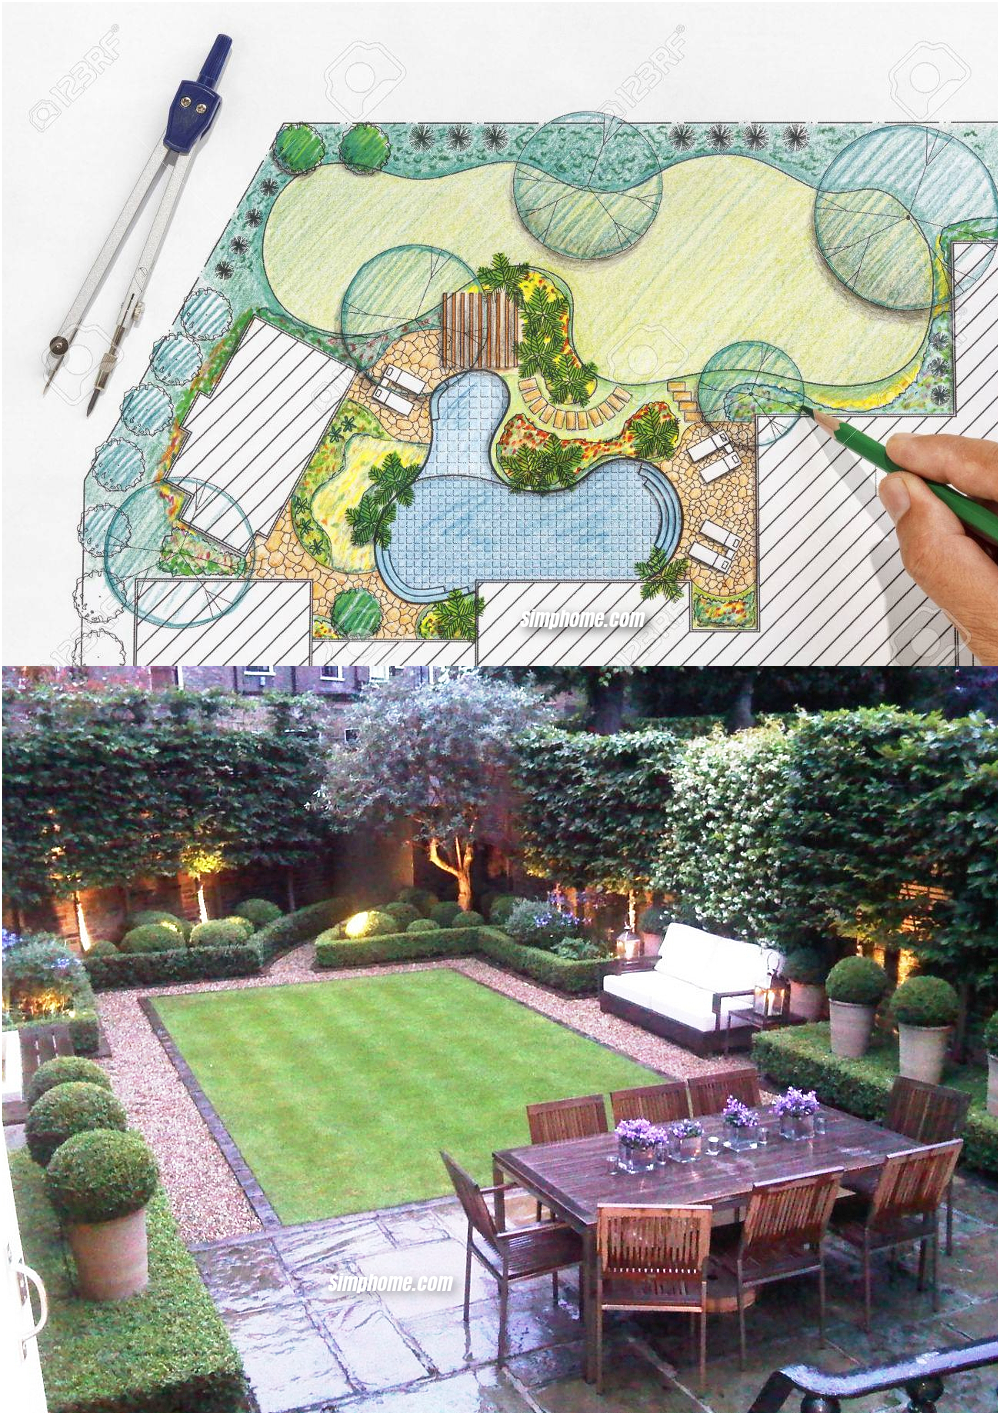 Simphome.com landscape architect design backyard plan for villa ideas